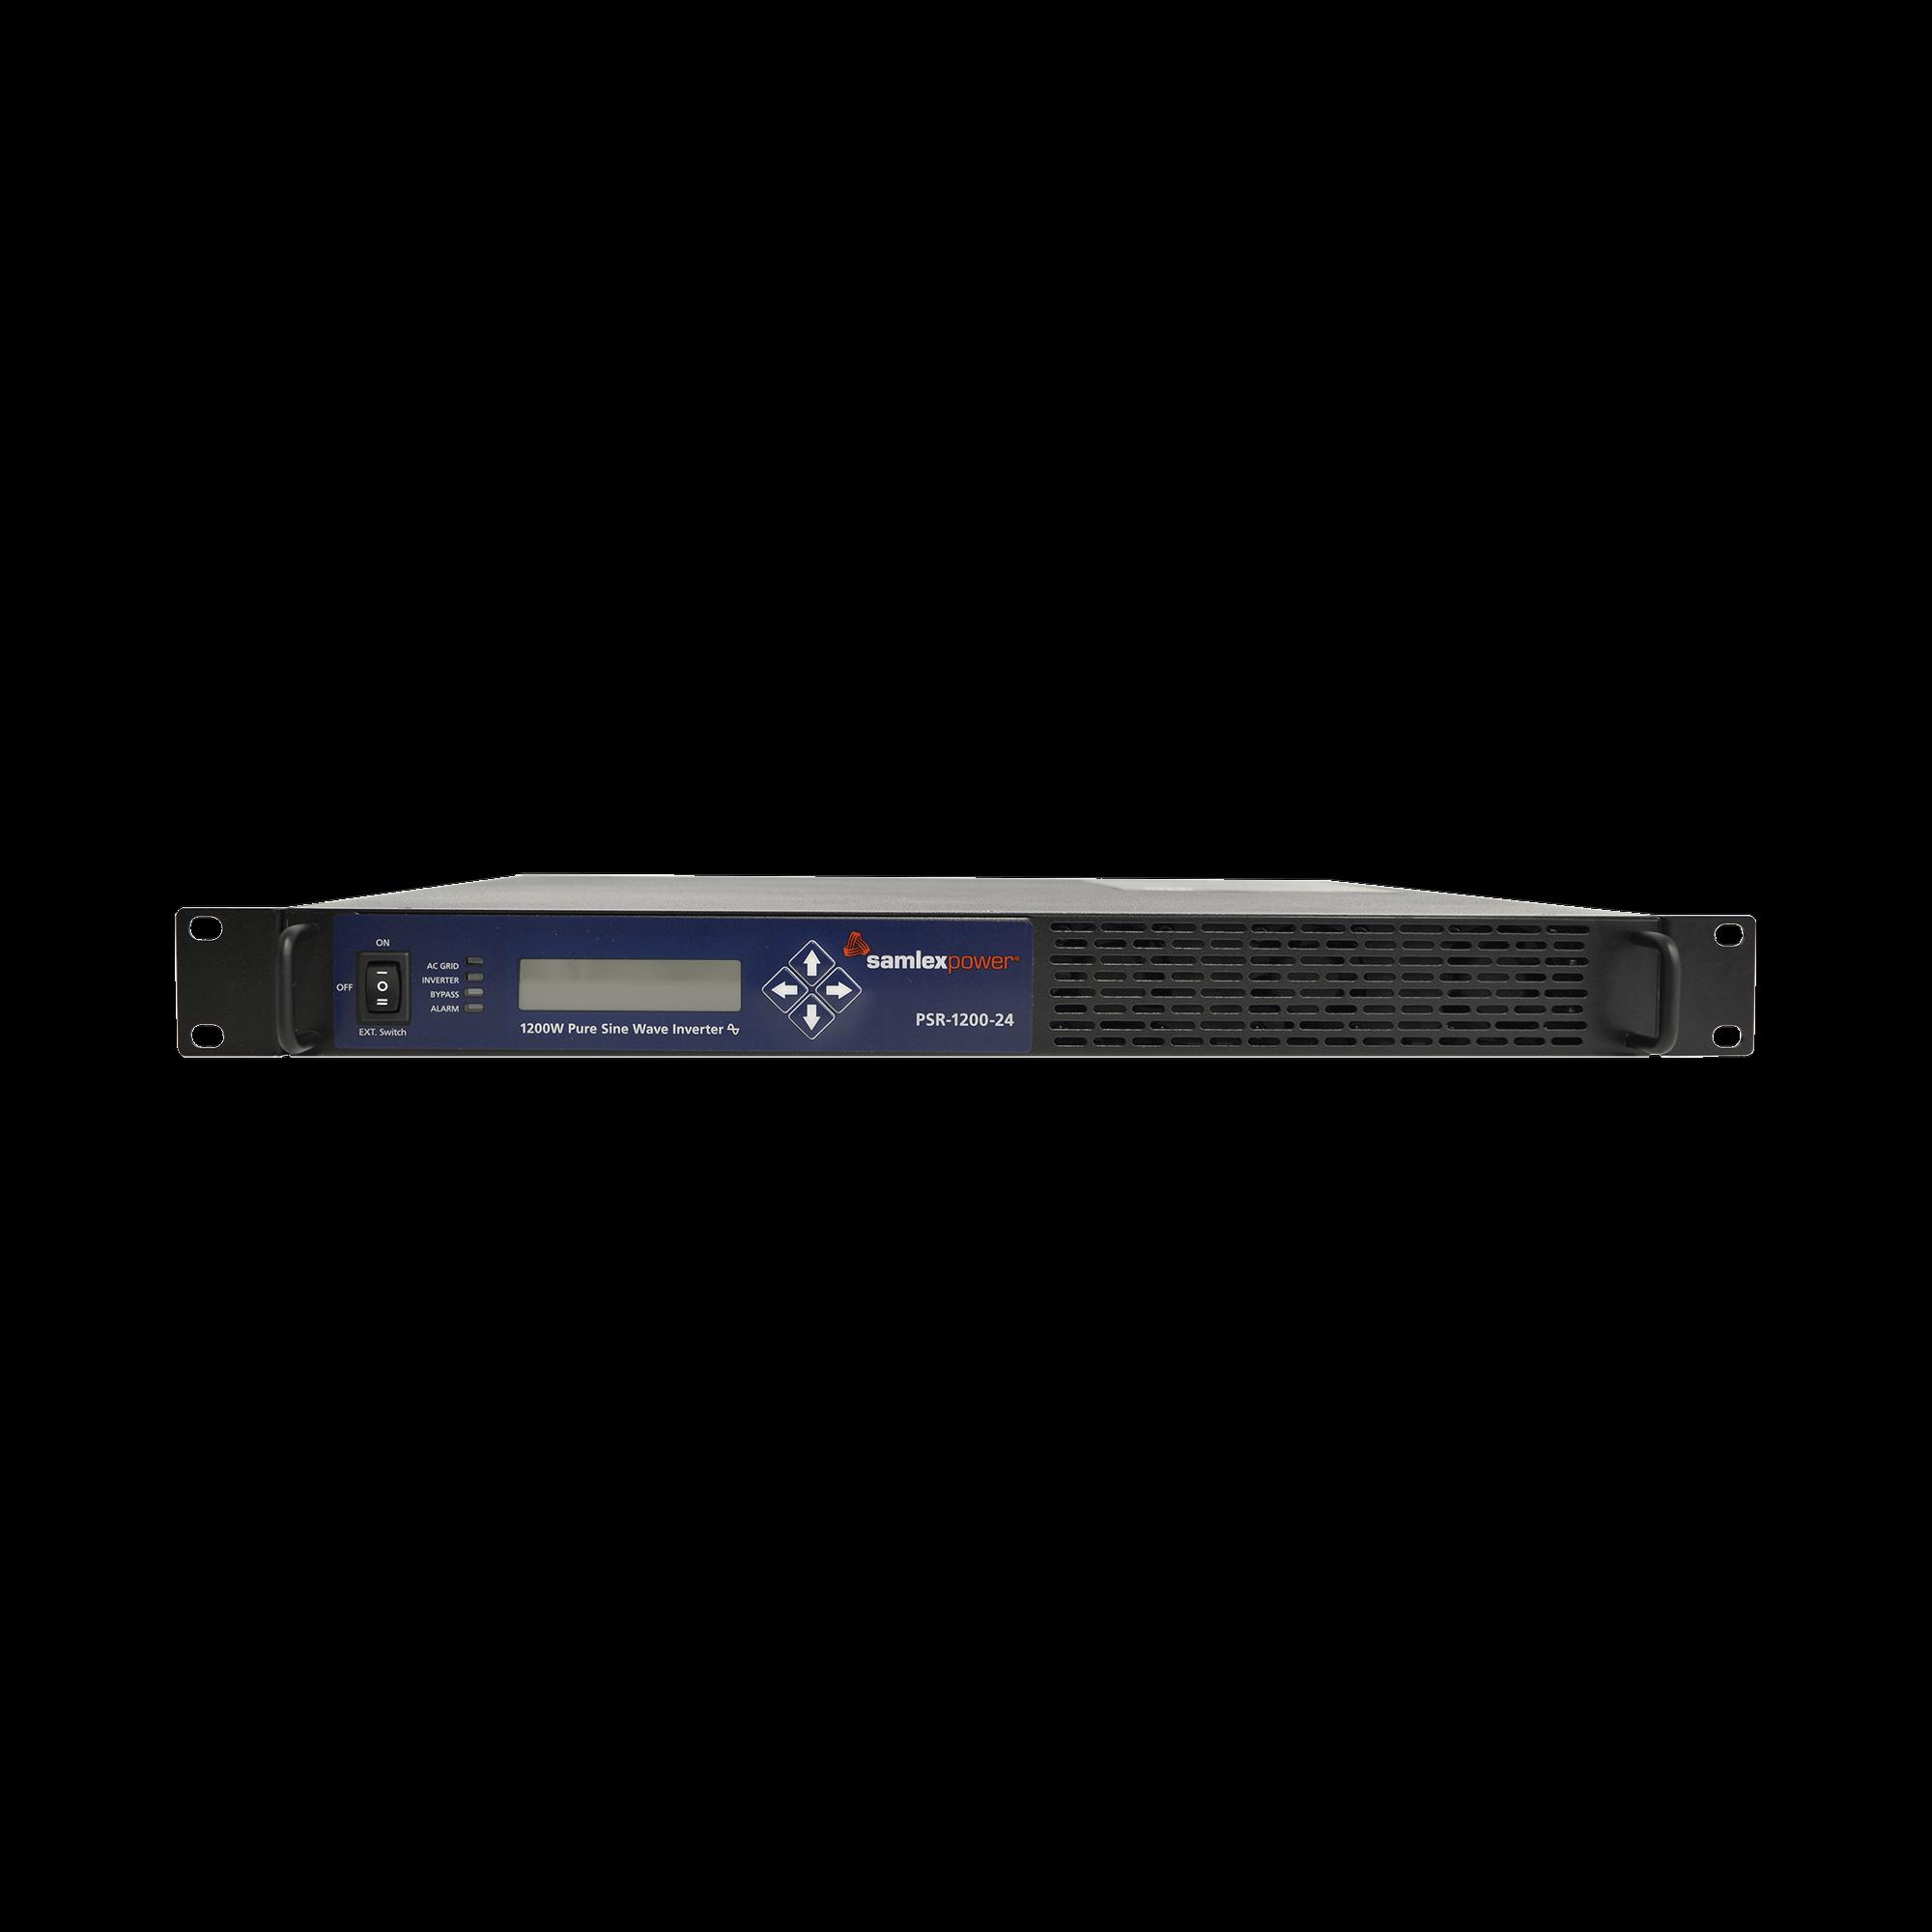 Inversor de corriente Onda Pura Montaje en rack 1U 1200W, 24 VCD- 120 VCA, 50/60 Hz